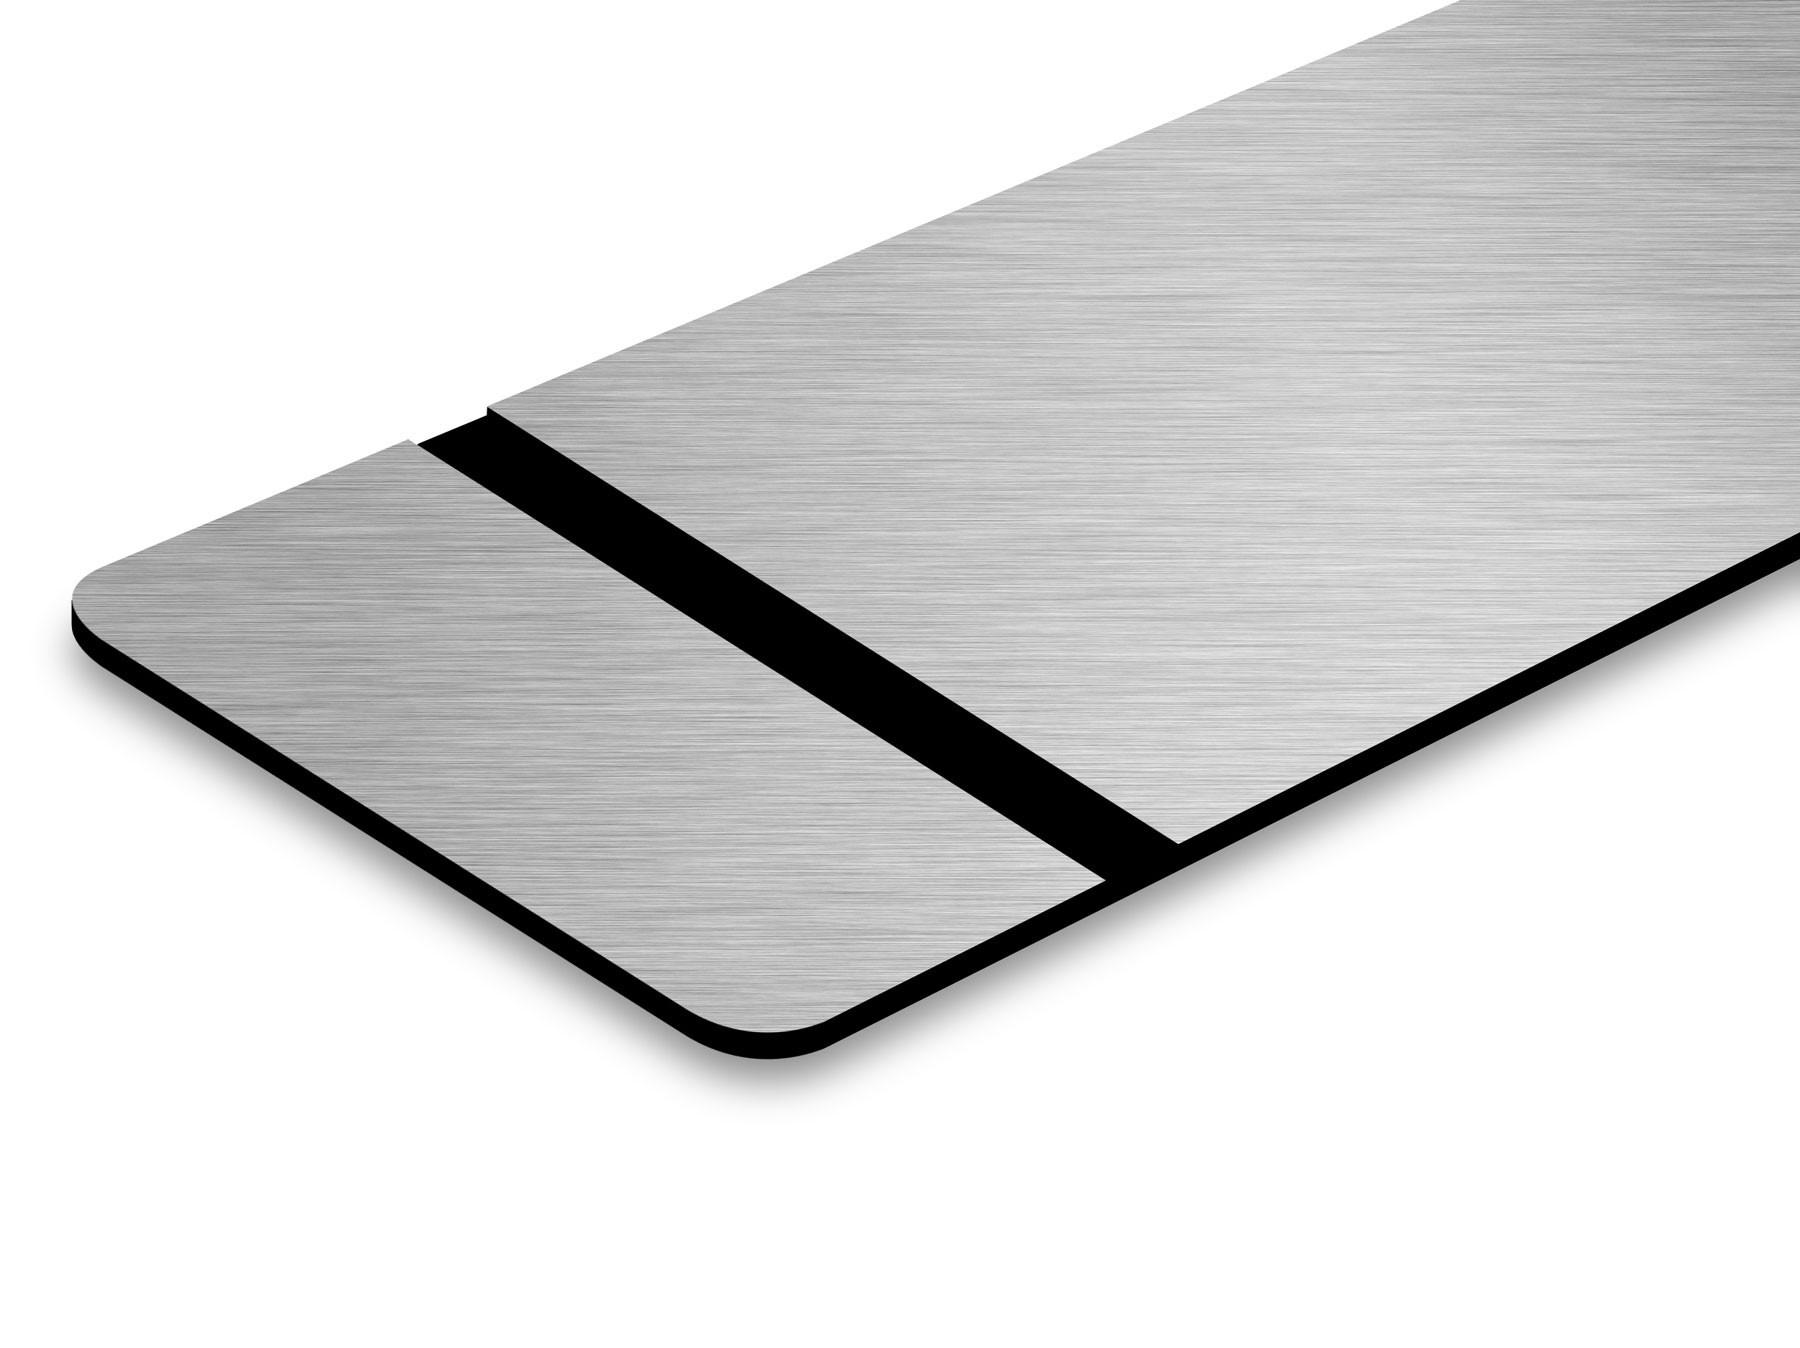 TroLase Lights, Brushed Silver/Black, 2ply, 0.1 mm